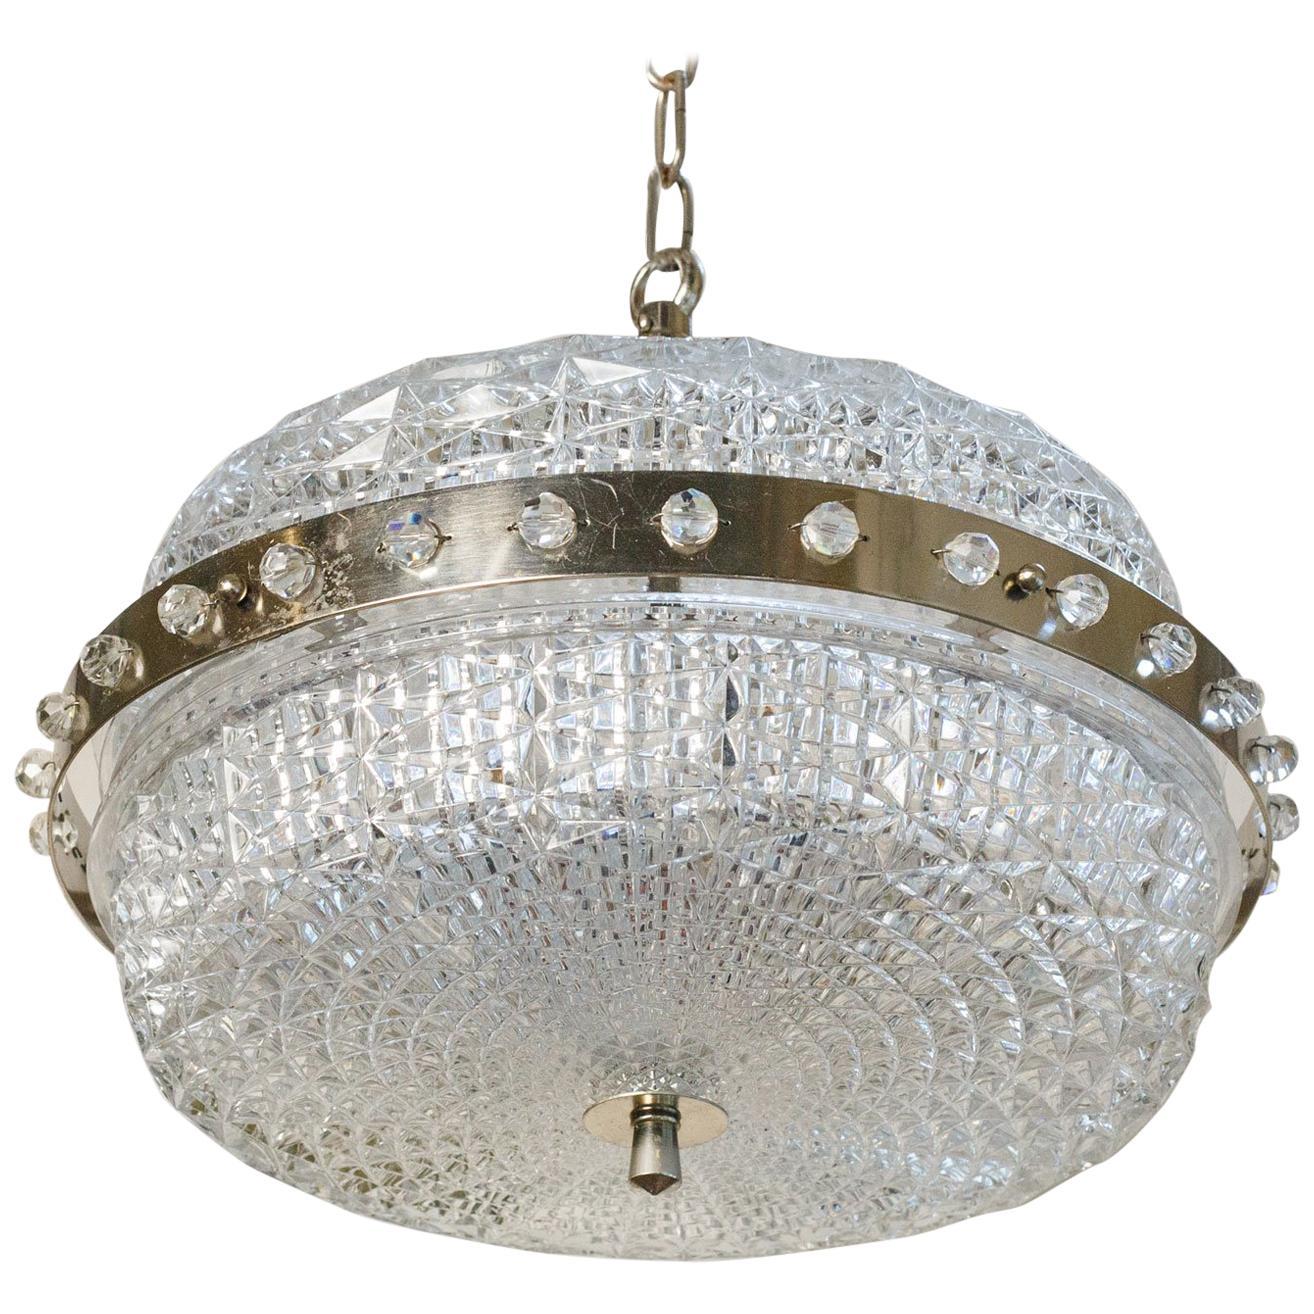 Extraordinary Mid-Century Modern Swedish Pressed Glass Pendant with brass detail